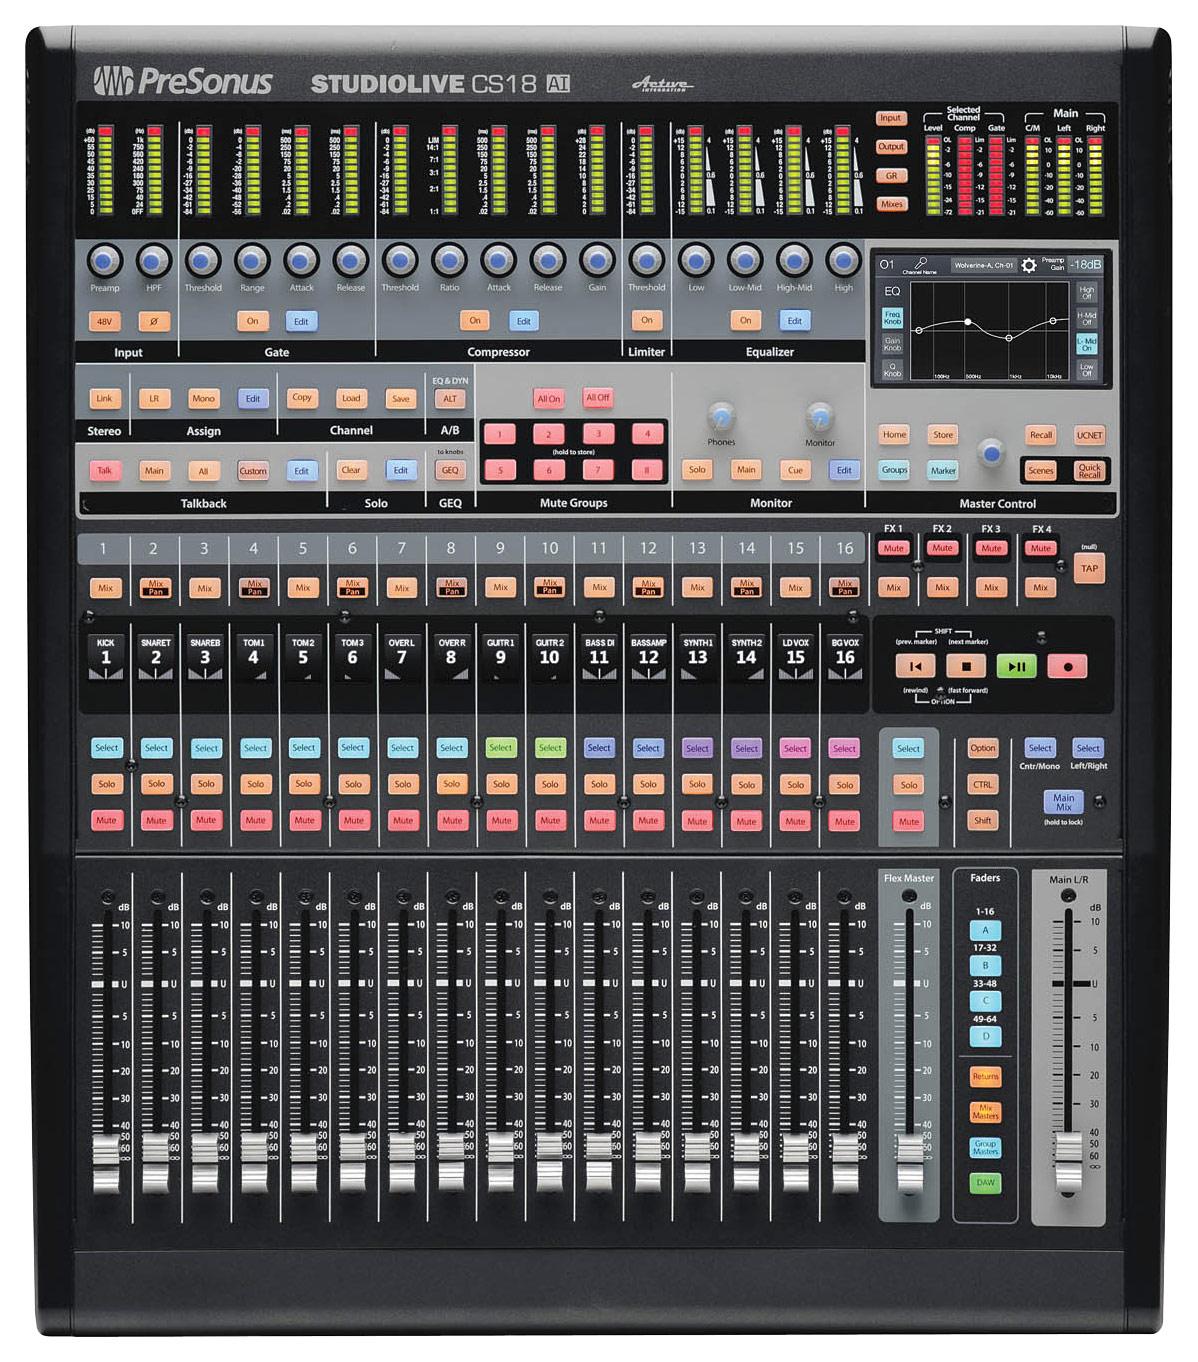 PreSonus - Ethernet/AVB Control Surface - Black largeFrontImage